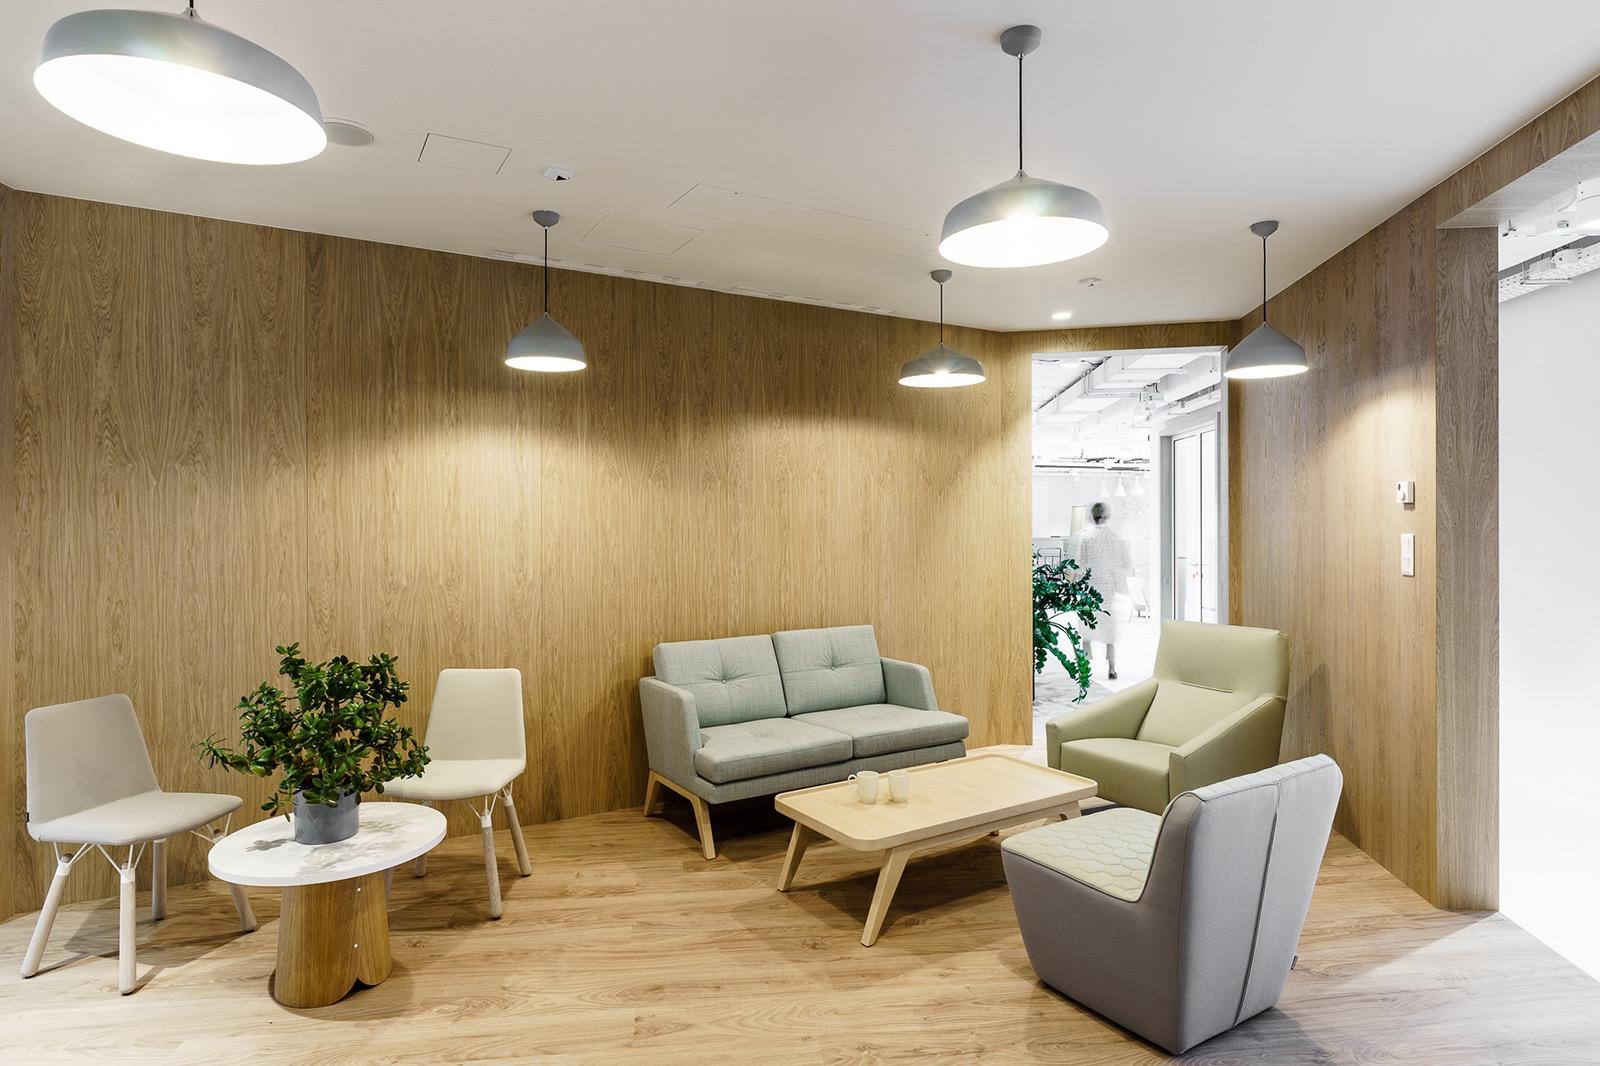 takeda-warsaw-office-3